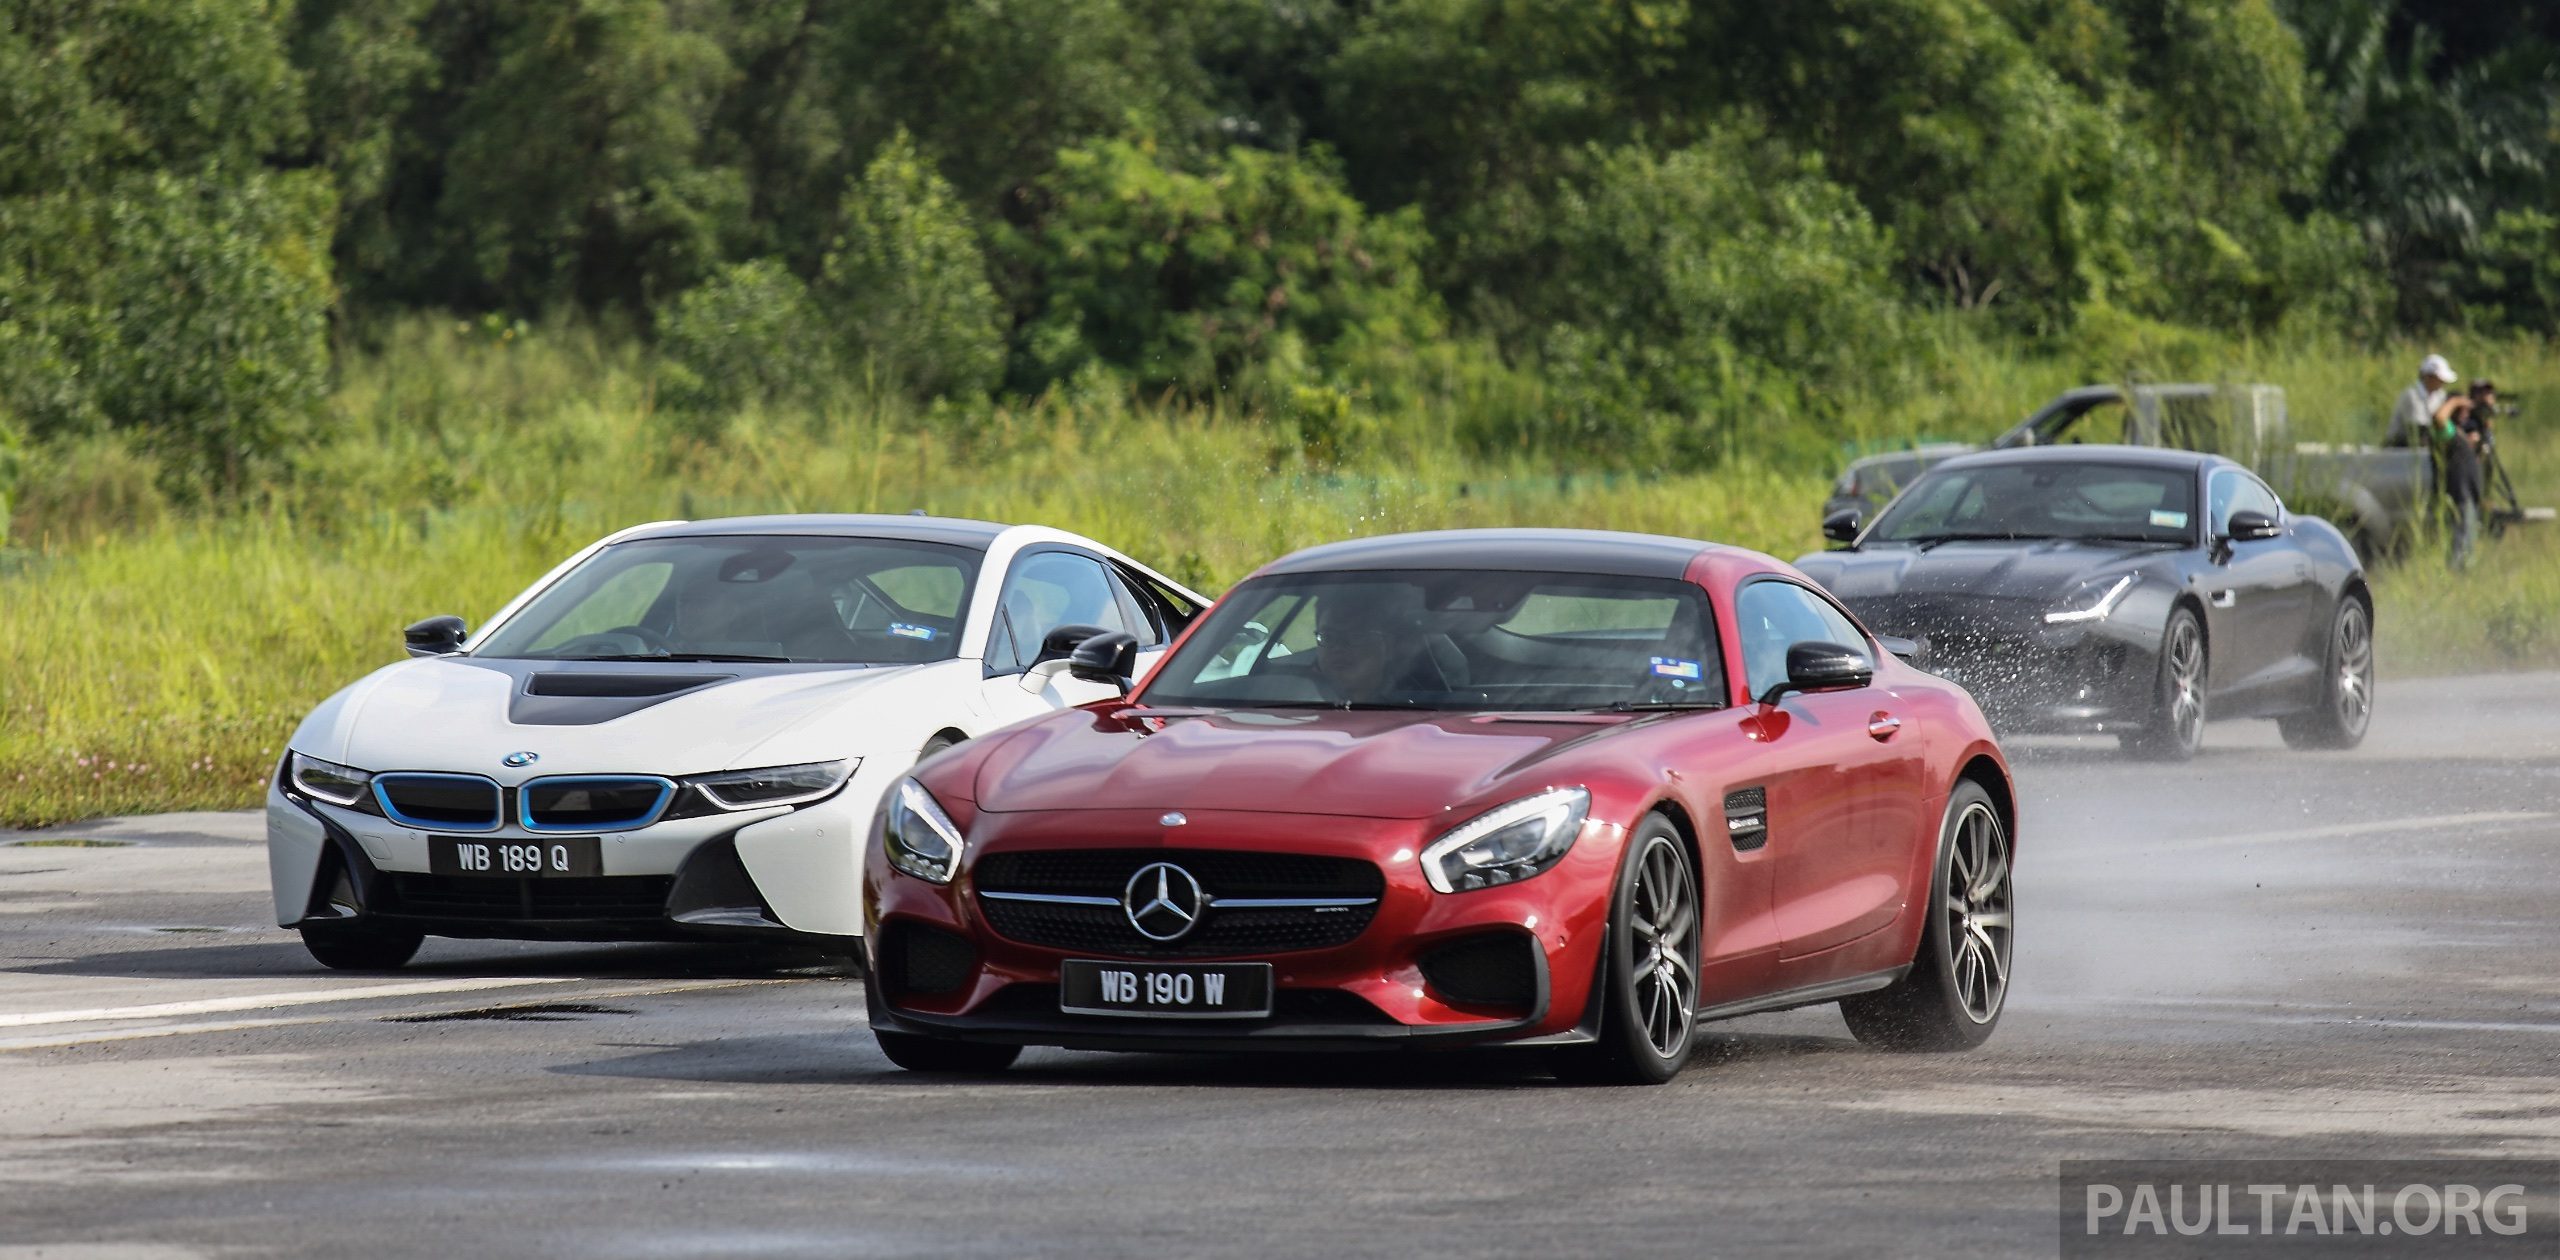 Driven Web Series 2015 #7: million ringgit sports cars ...